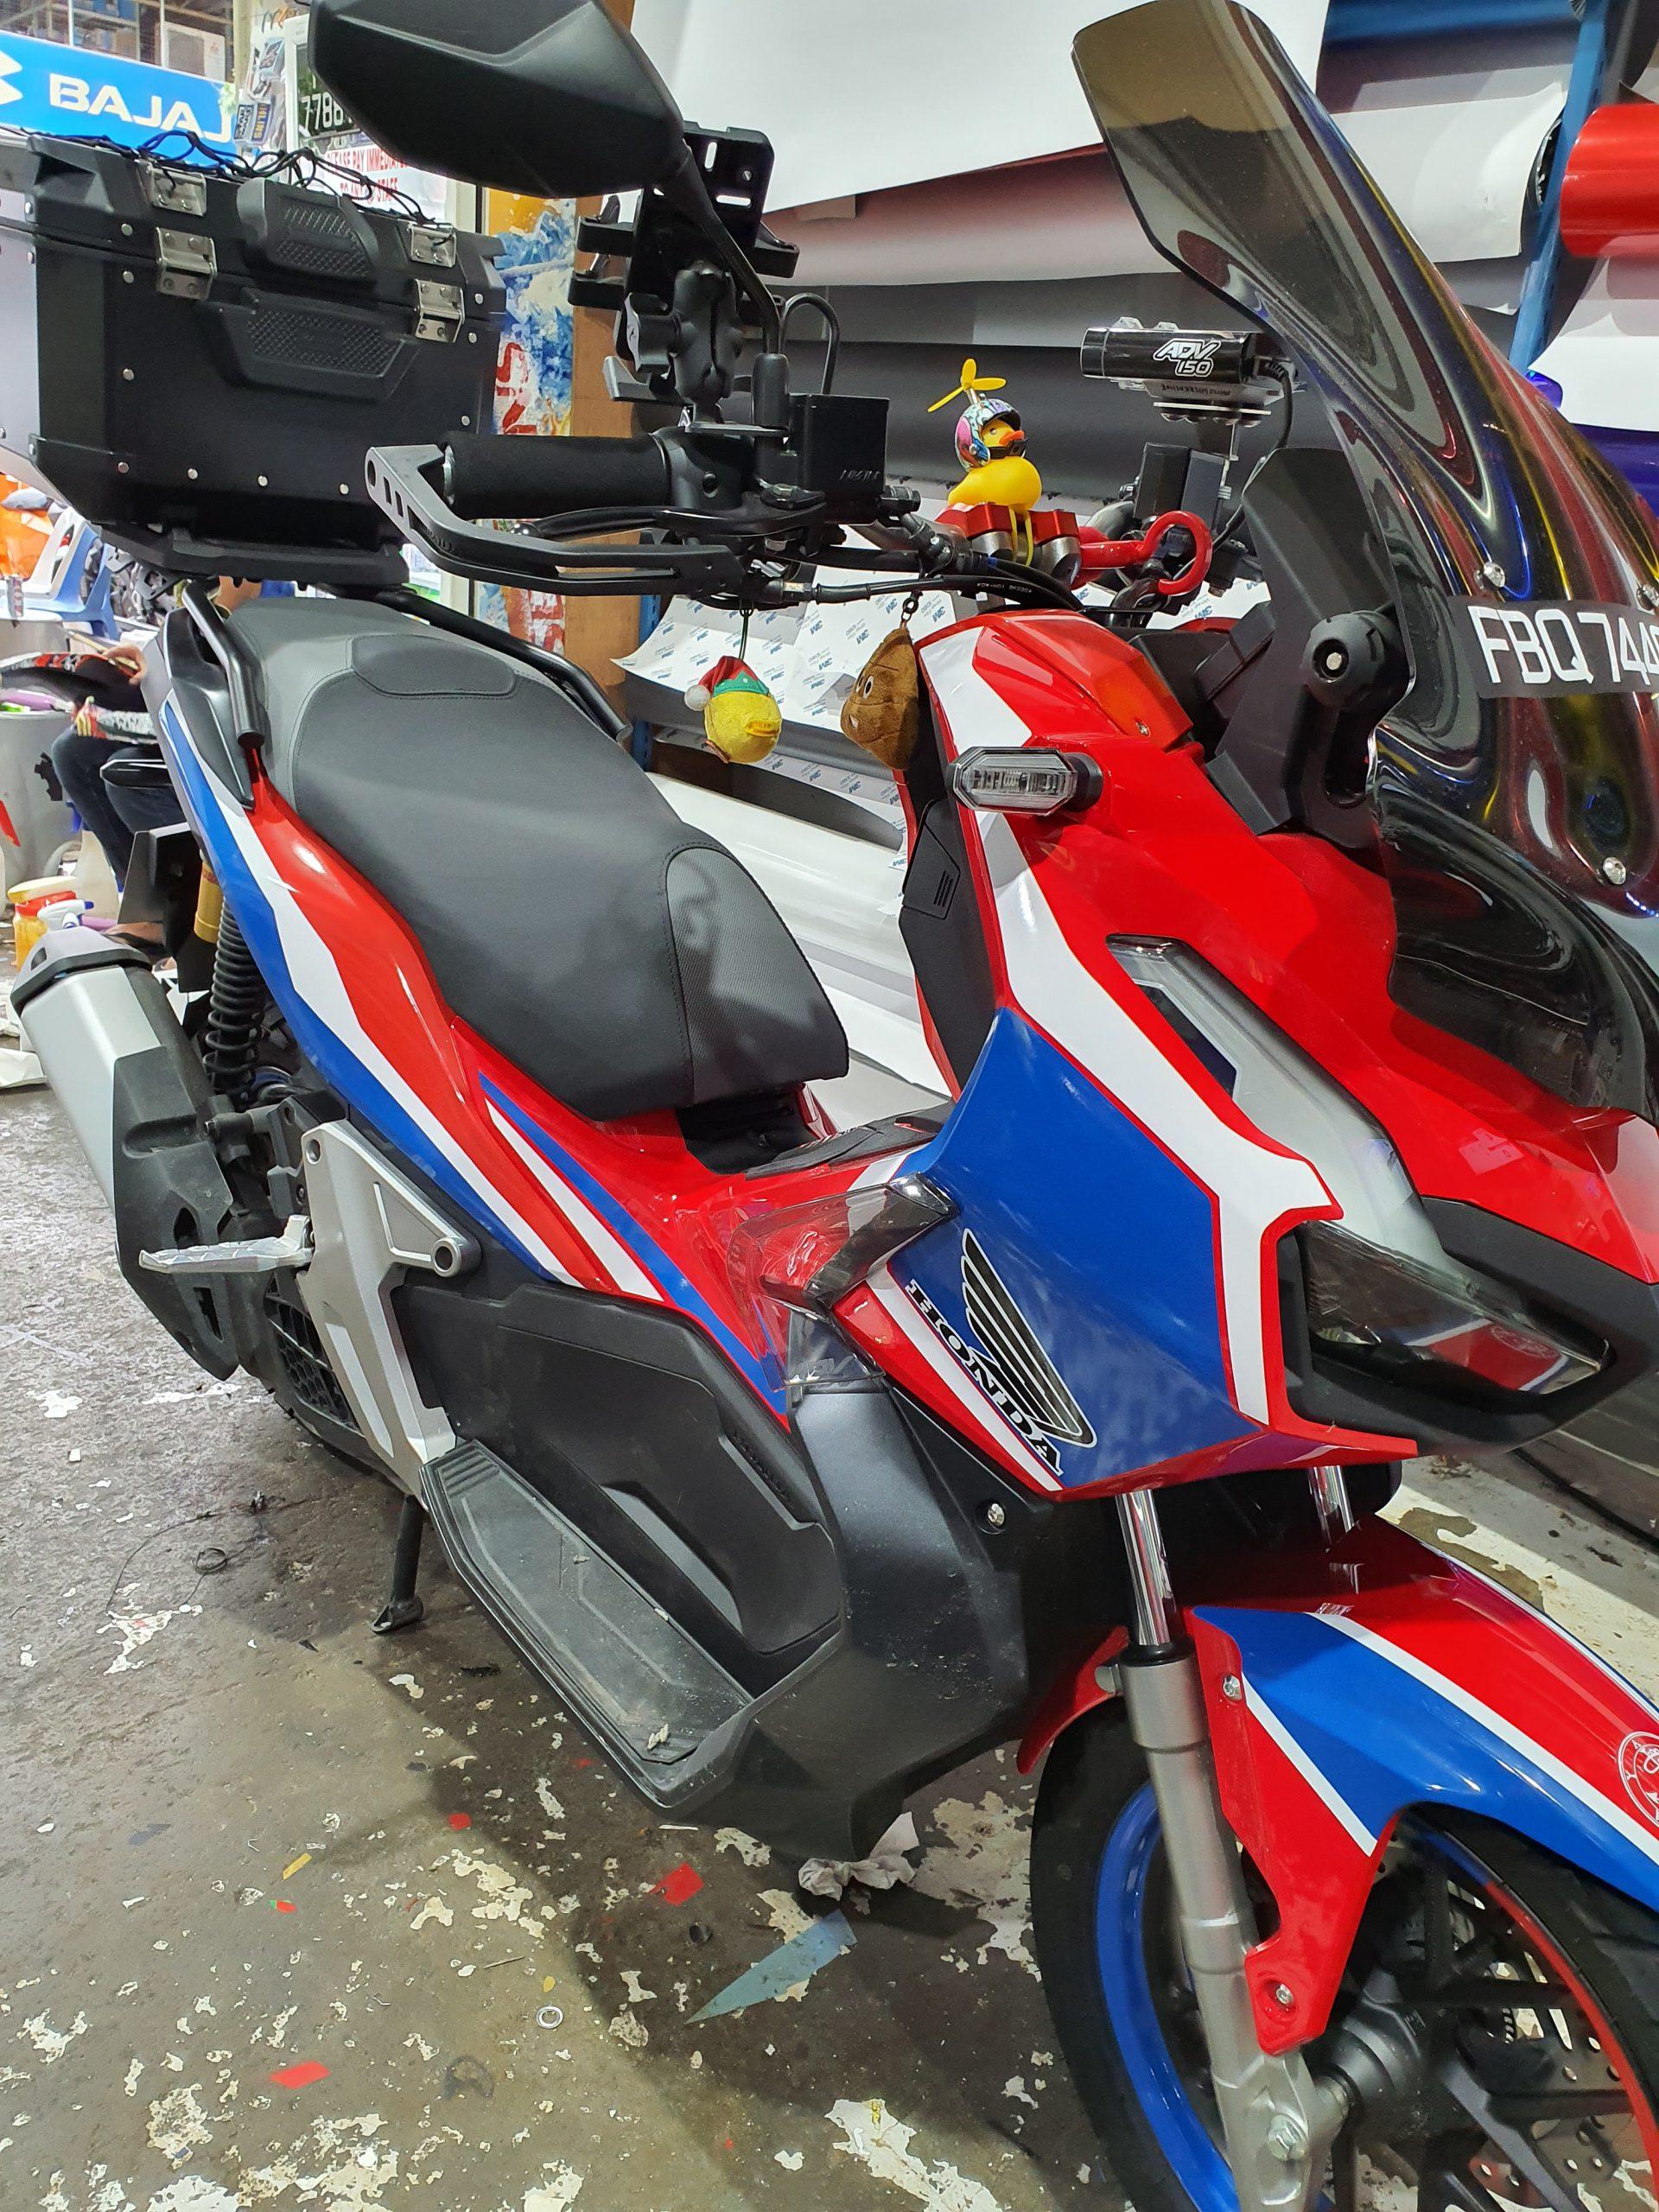 Honda ADV 150 Side Profile